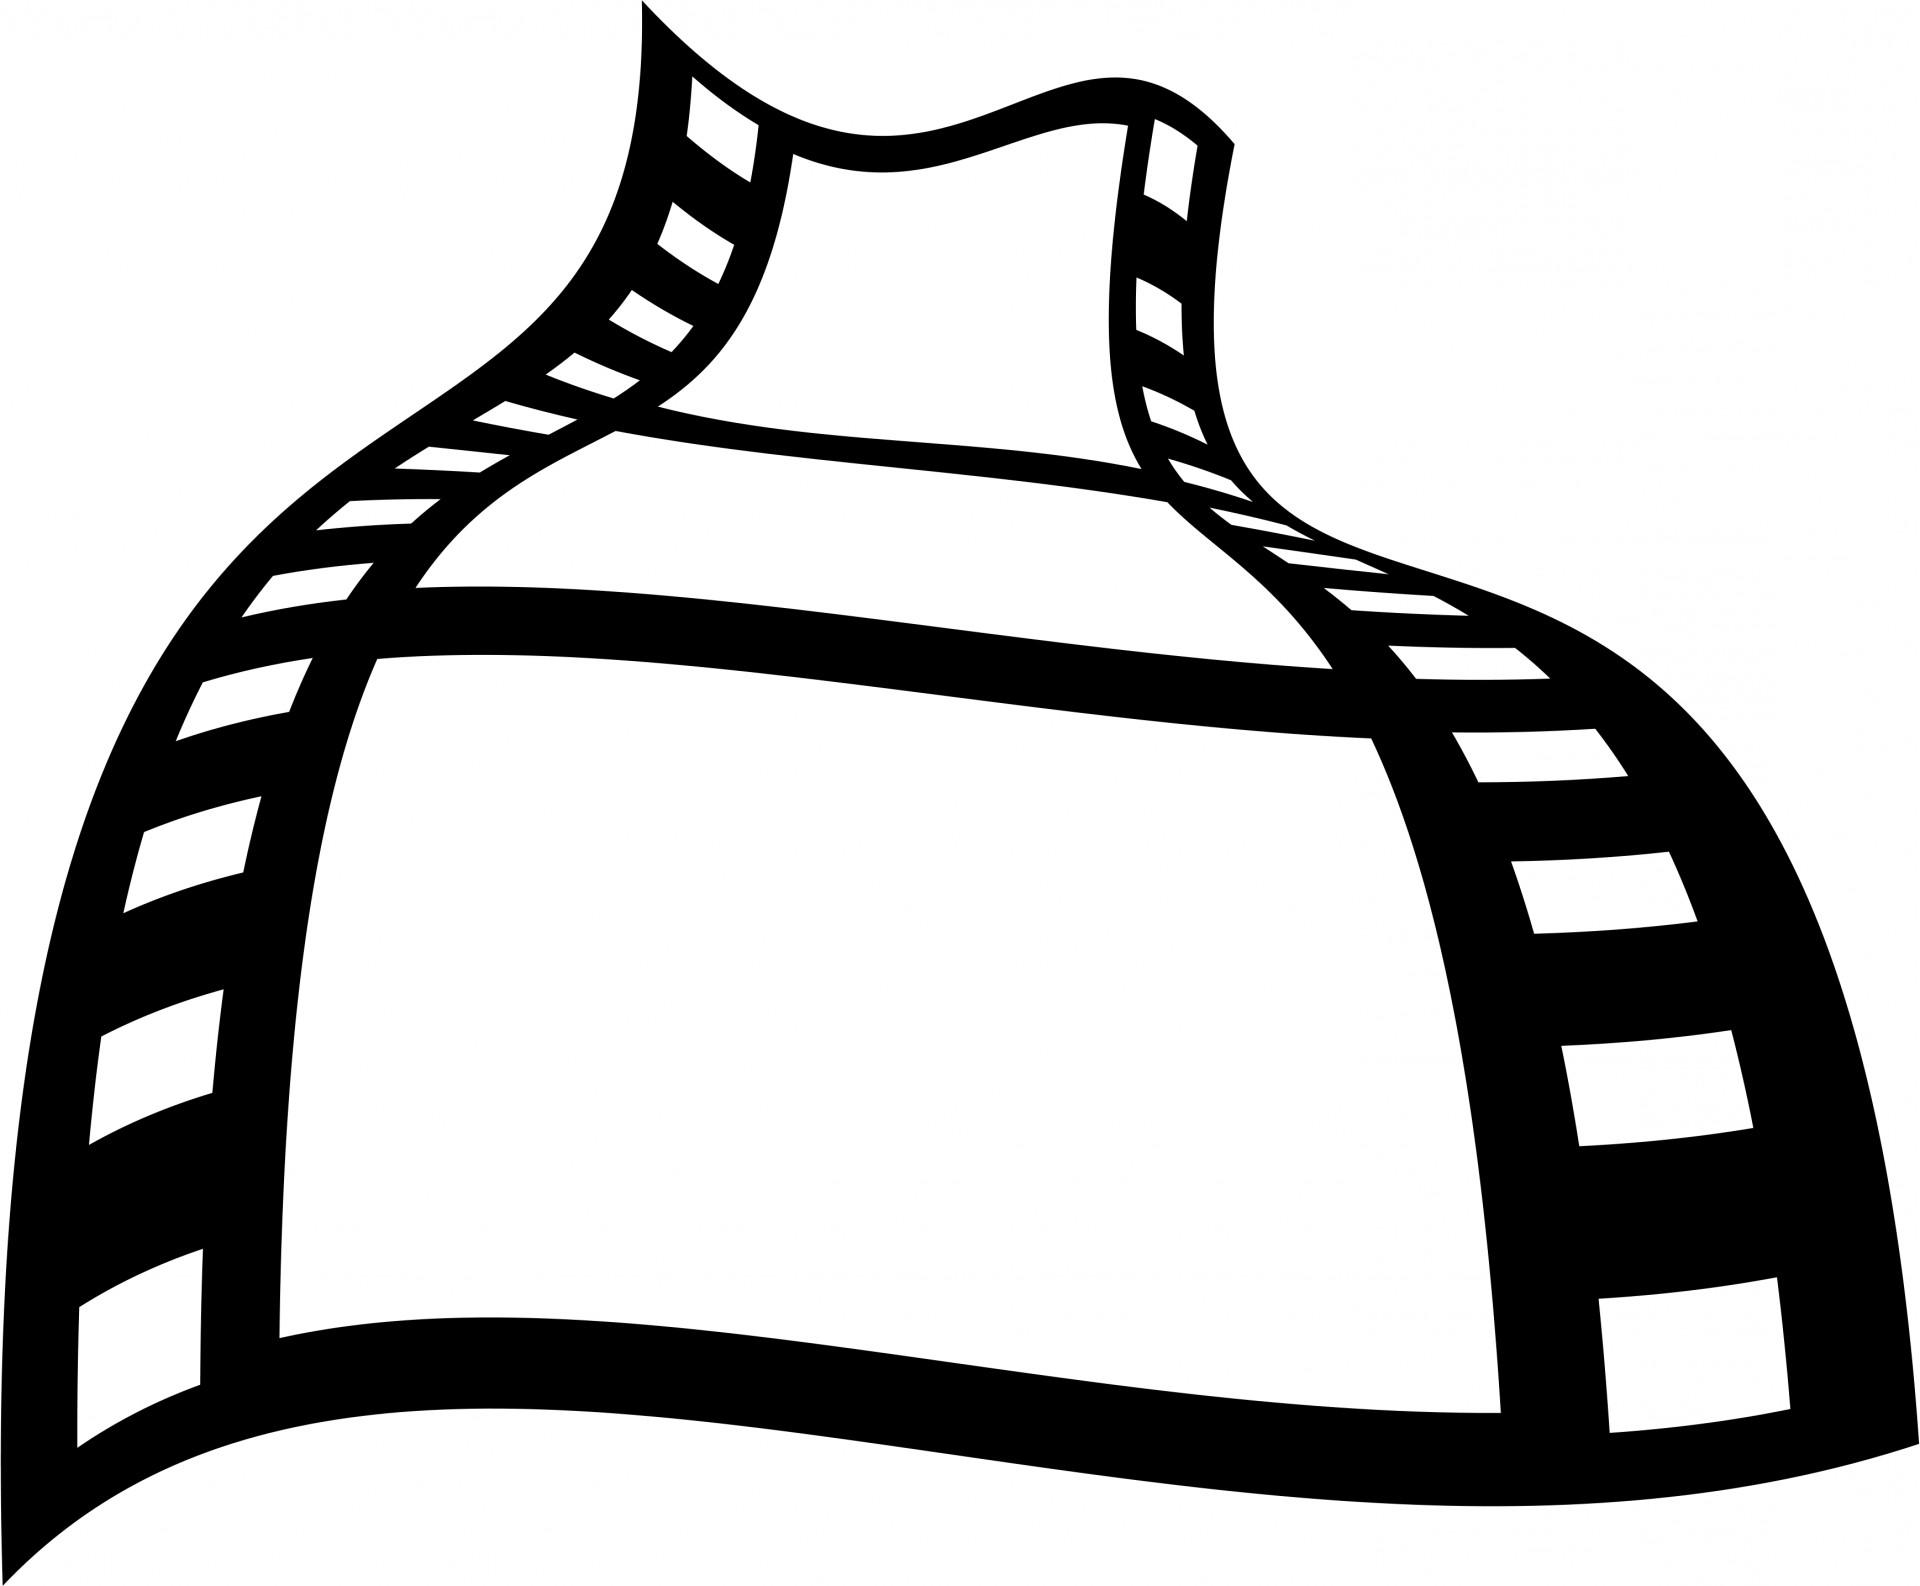 1920x1586 Best Free Movie Reel Film Strip Clip Art Image